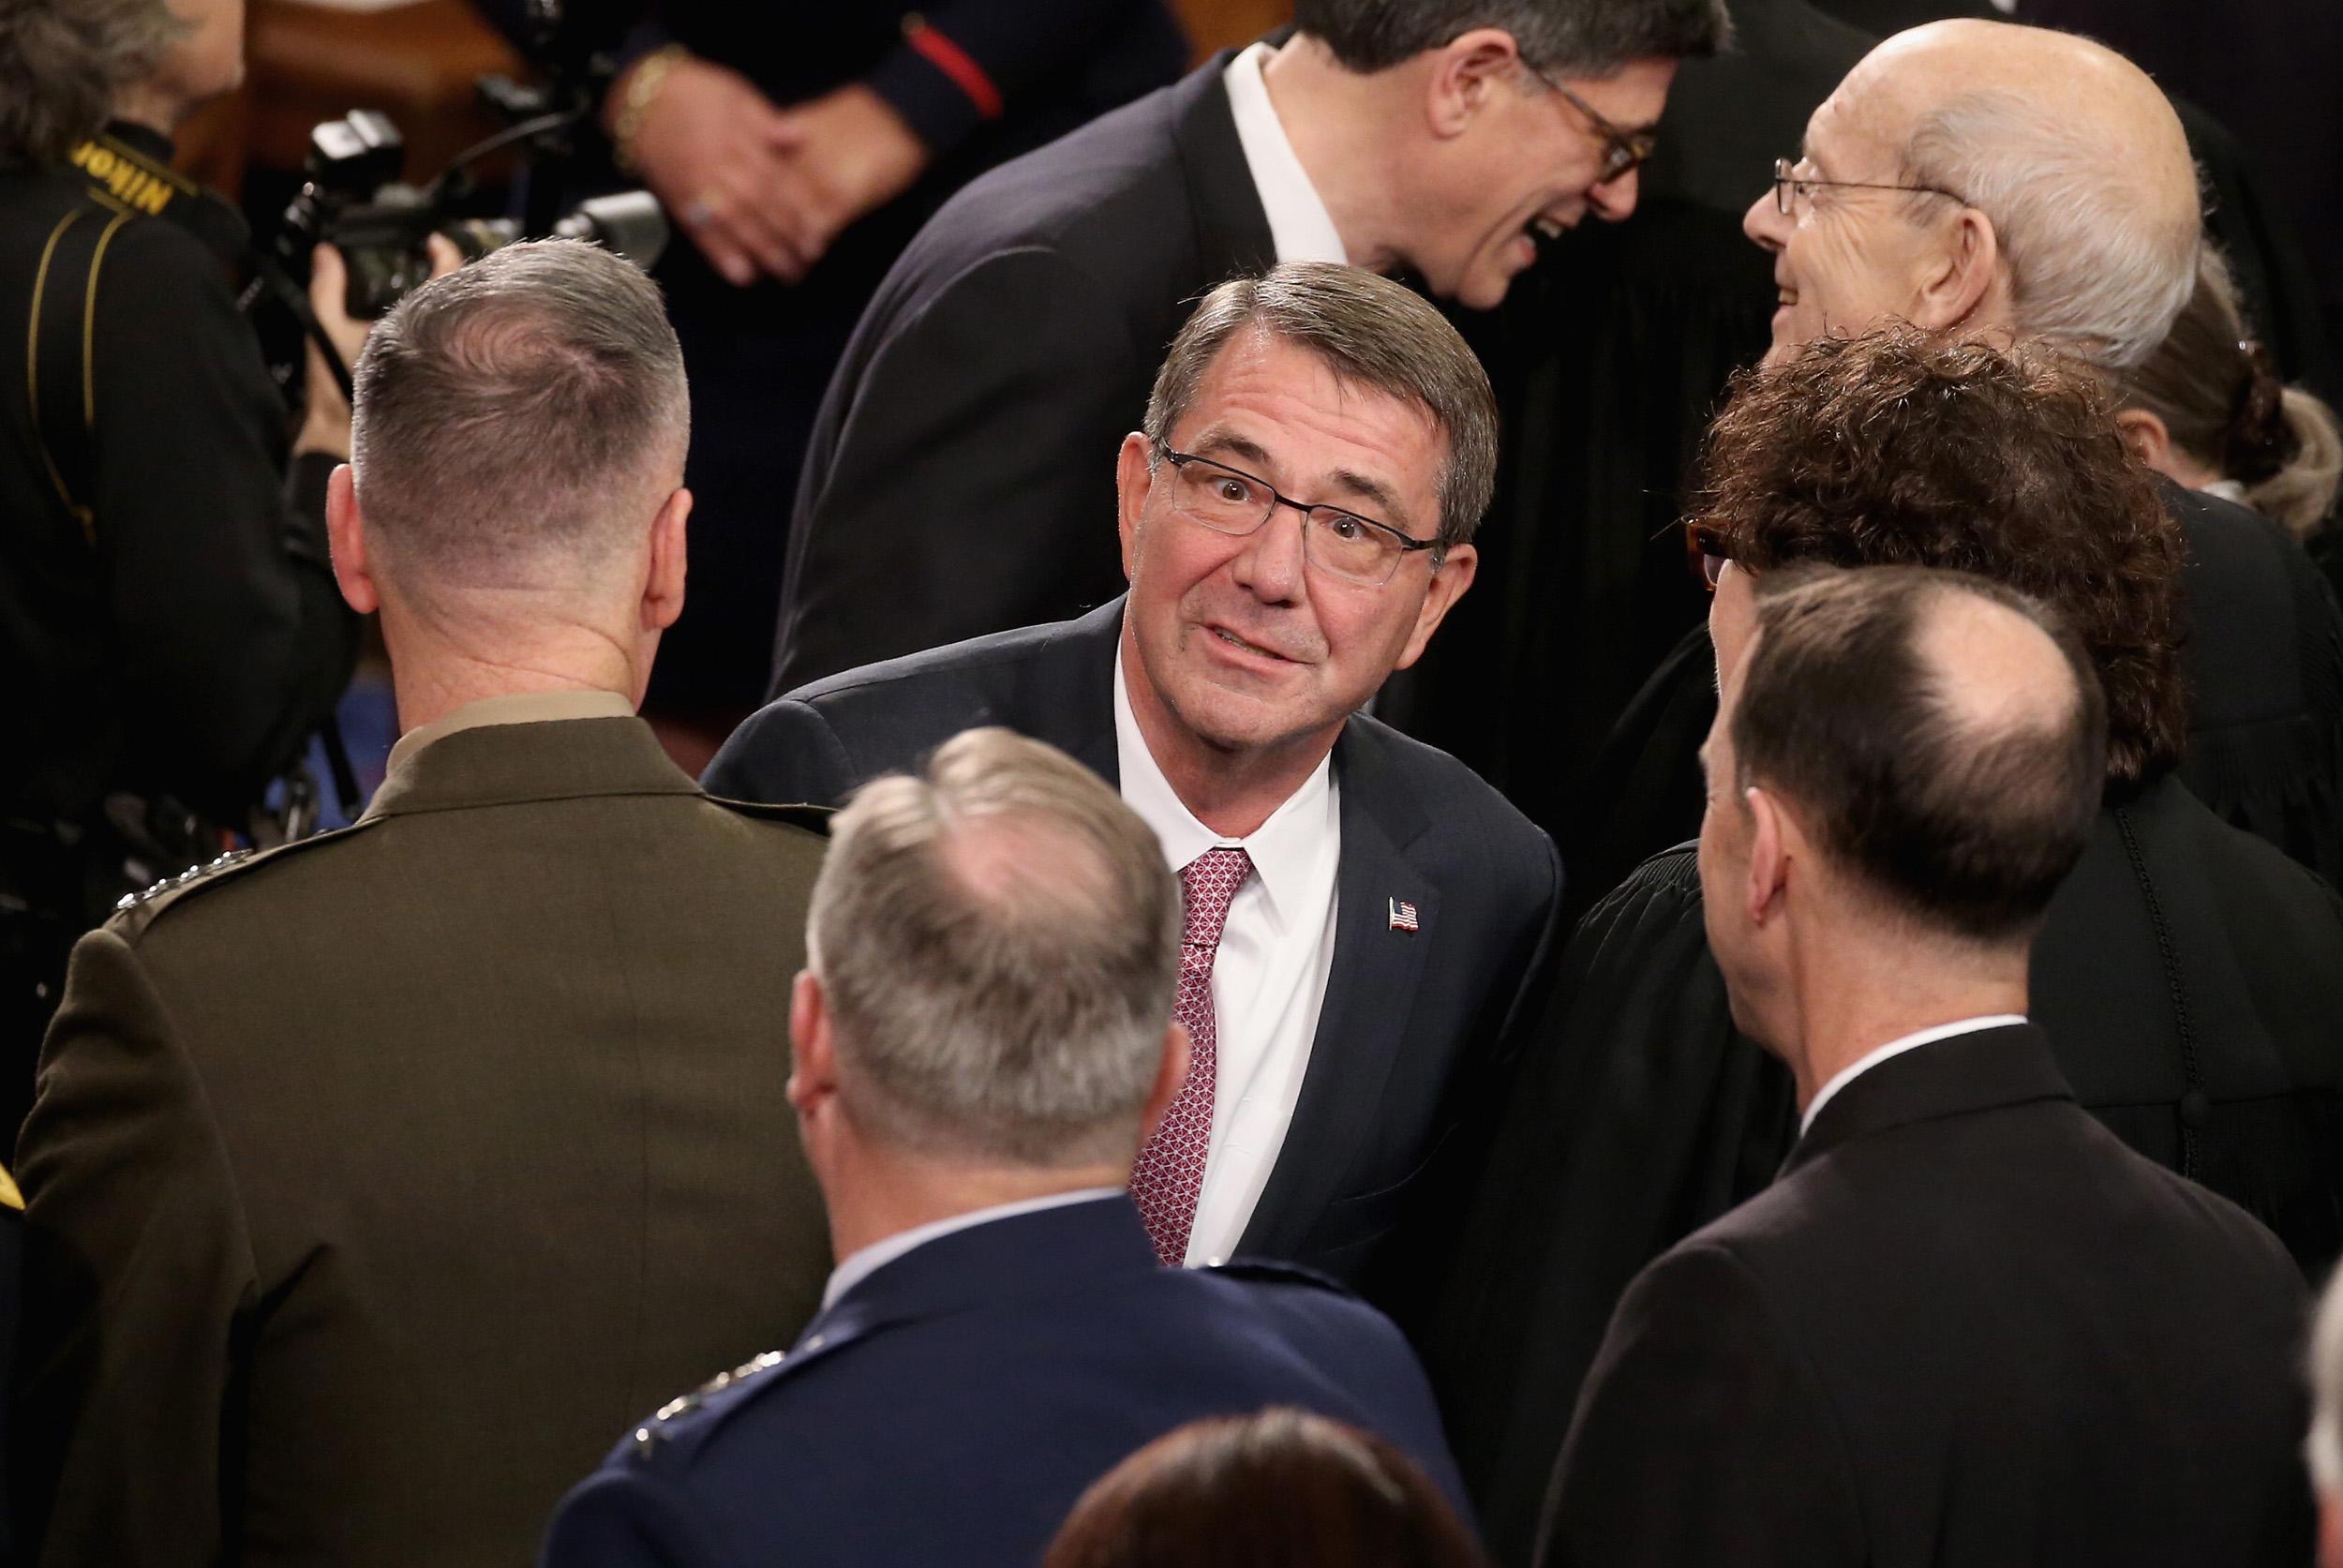 Defense Secretary Ash Carter, State of the Union